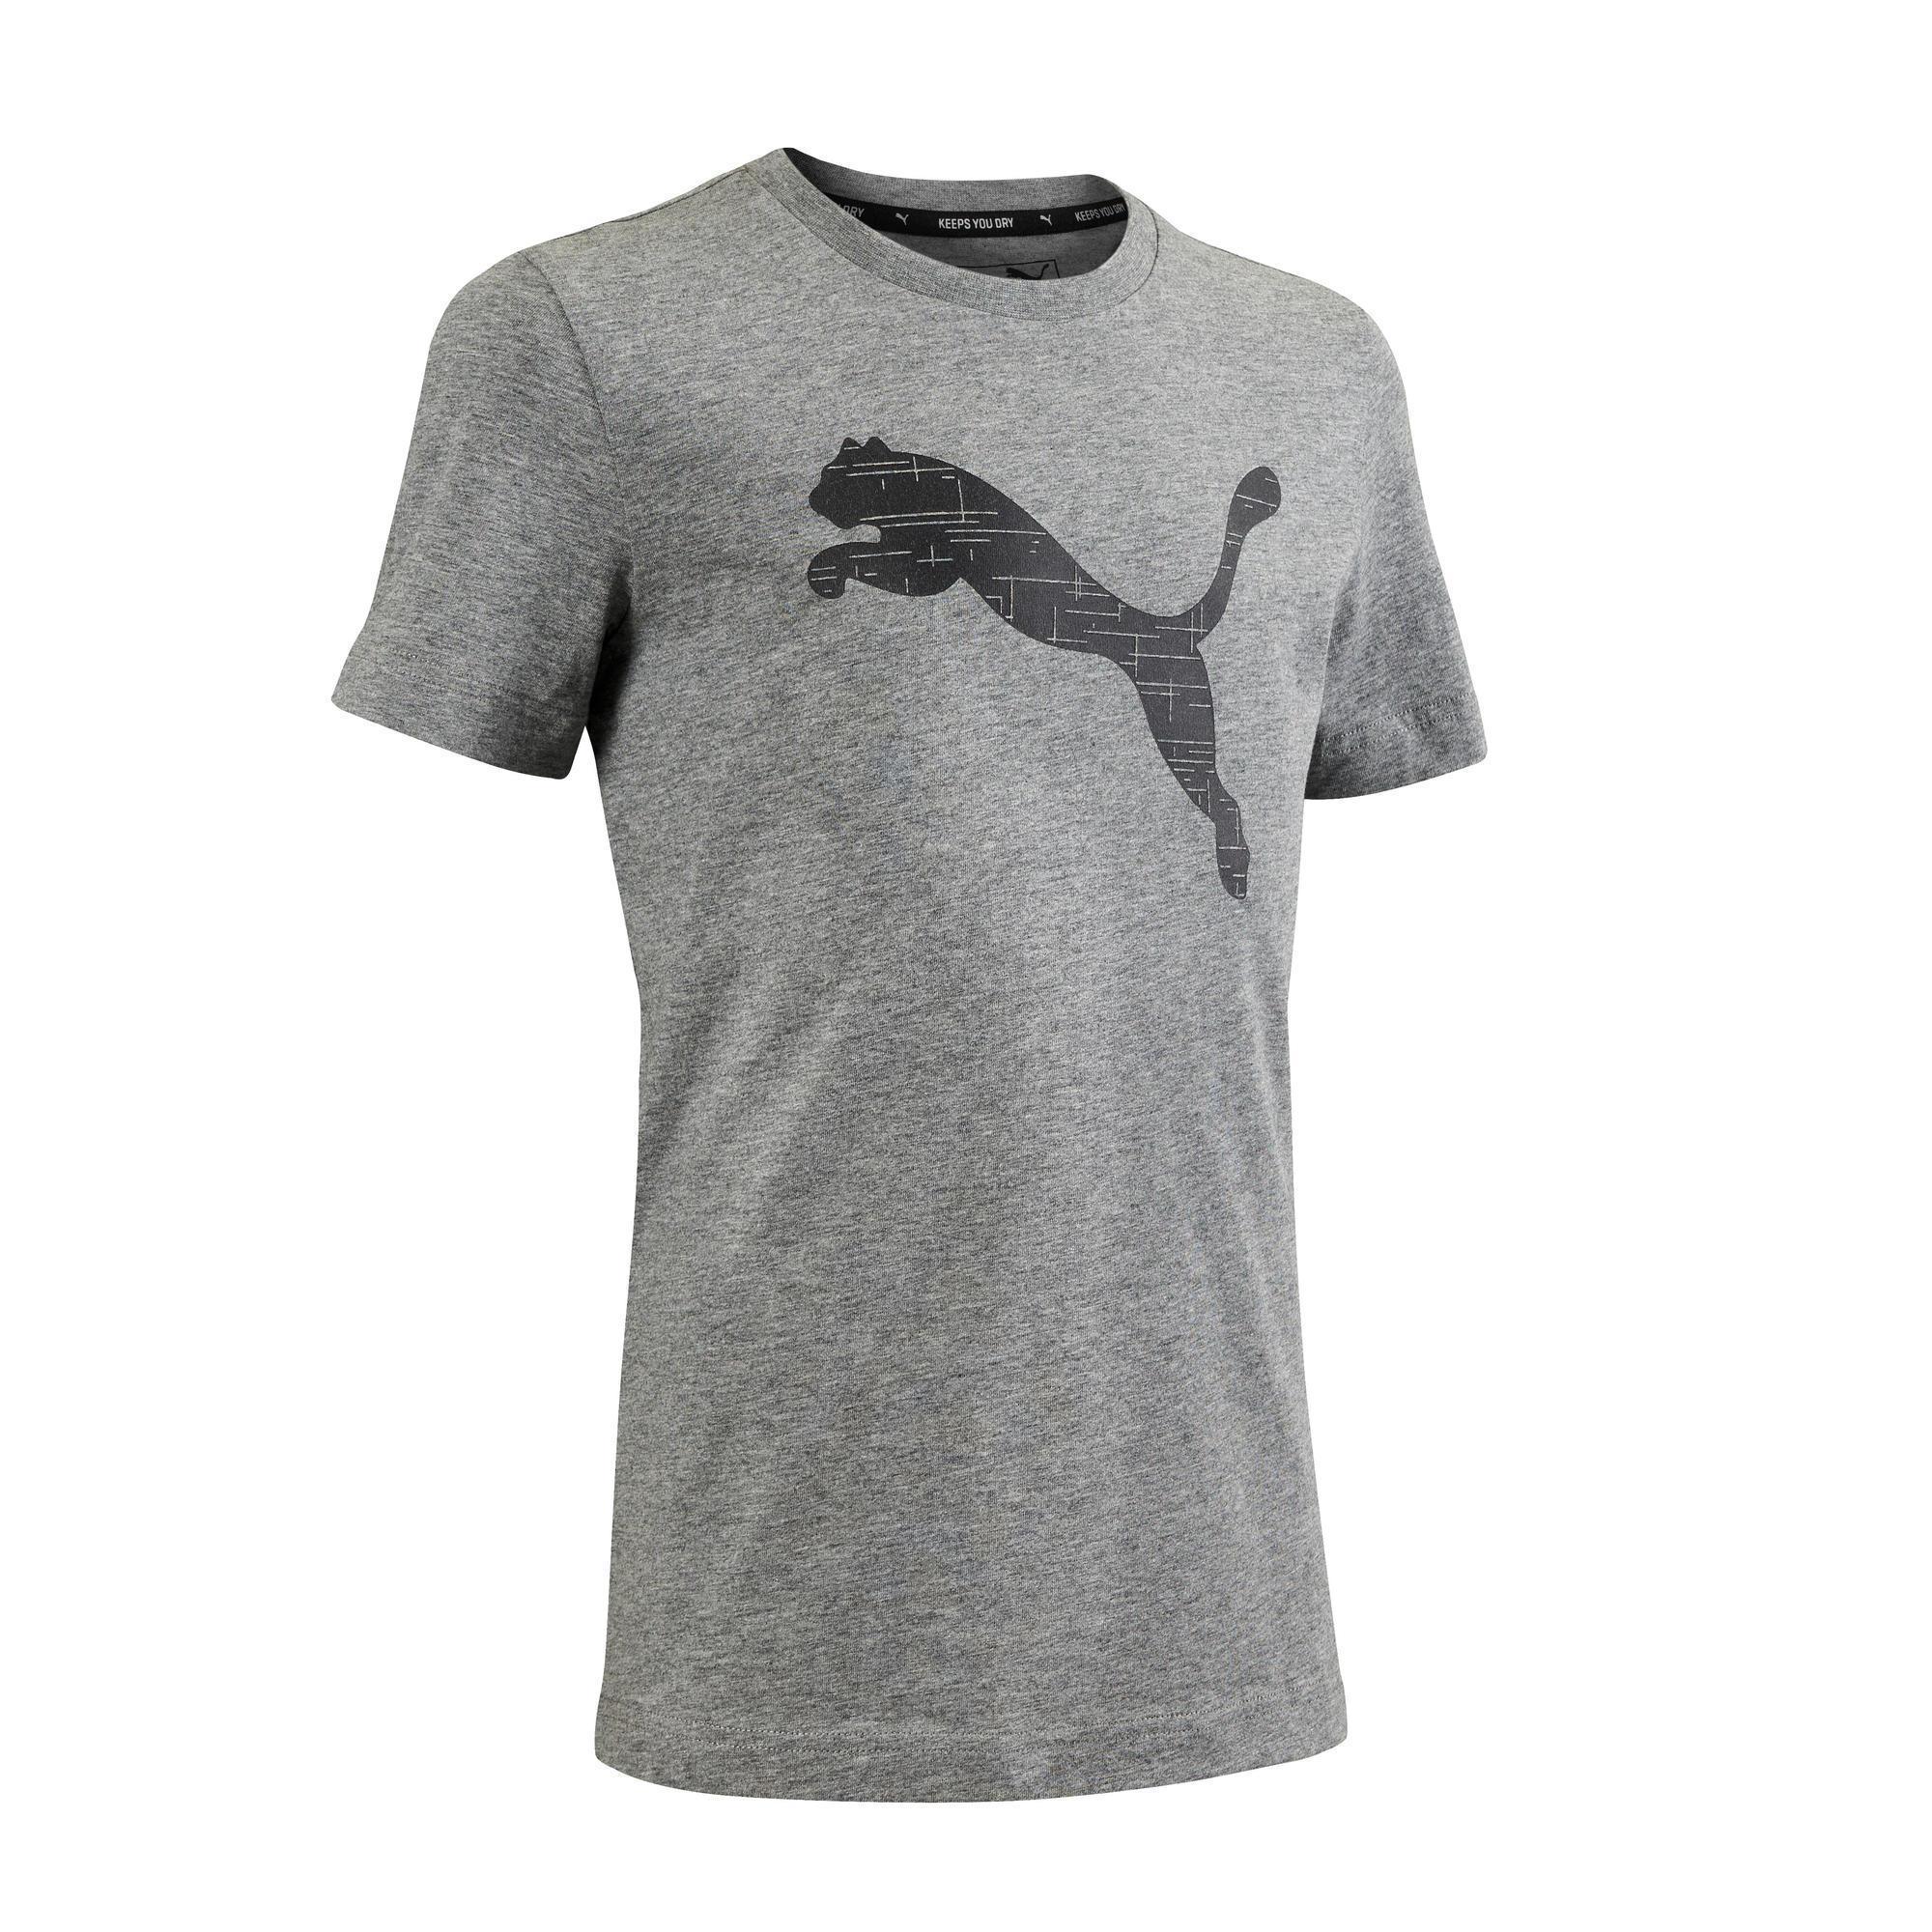 Puma T-shirt grijs regular fit groot logo katoen PUMA